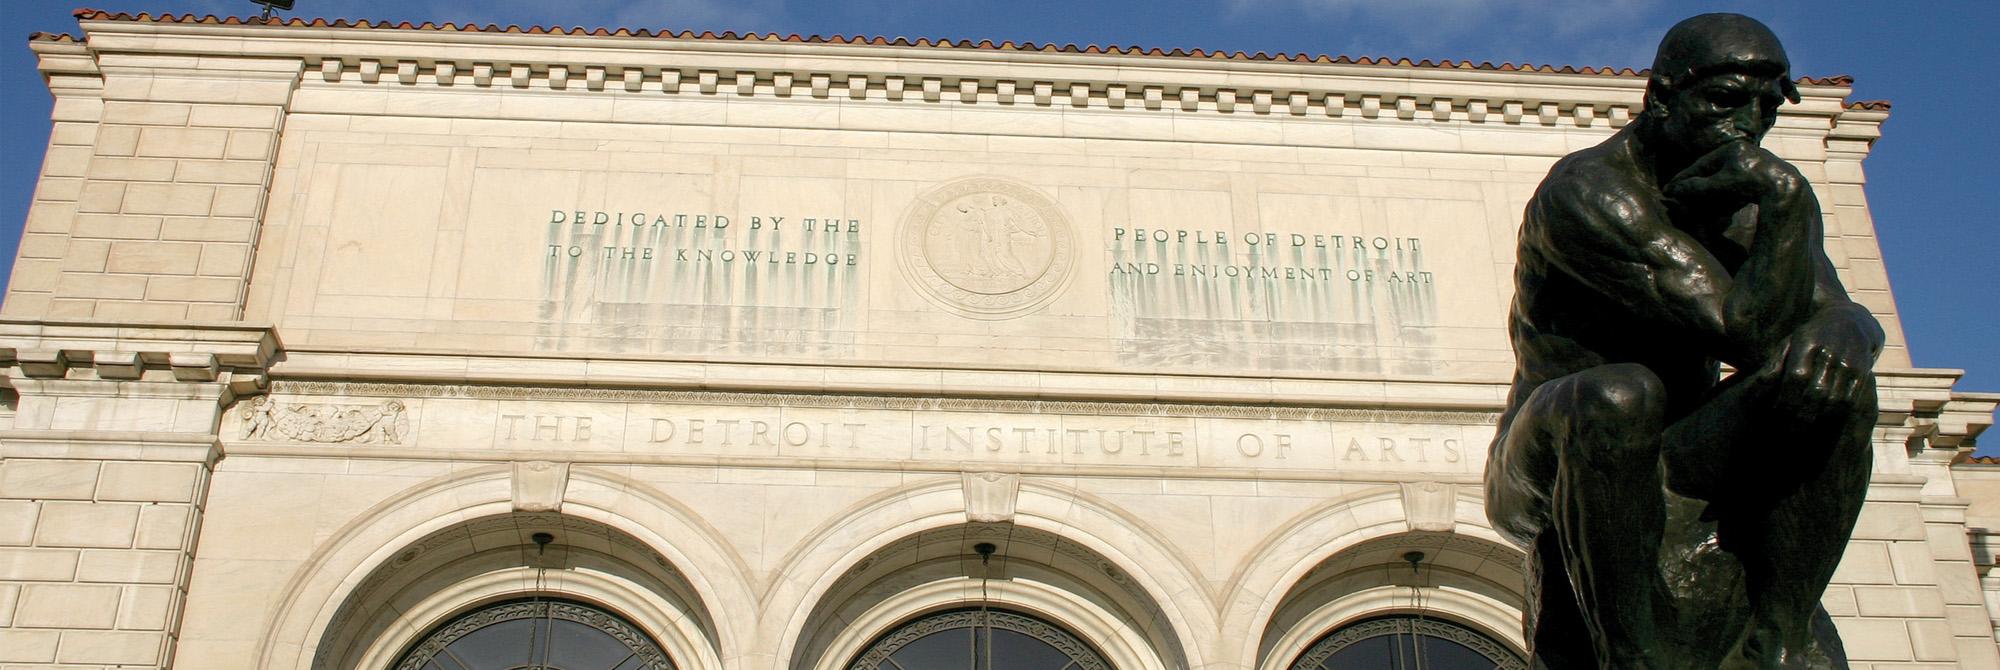 Detroit Institute of Arts. Photo by Bill Bowen. Courtesy of visitdetroit.com